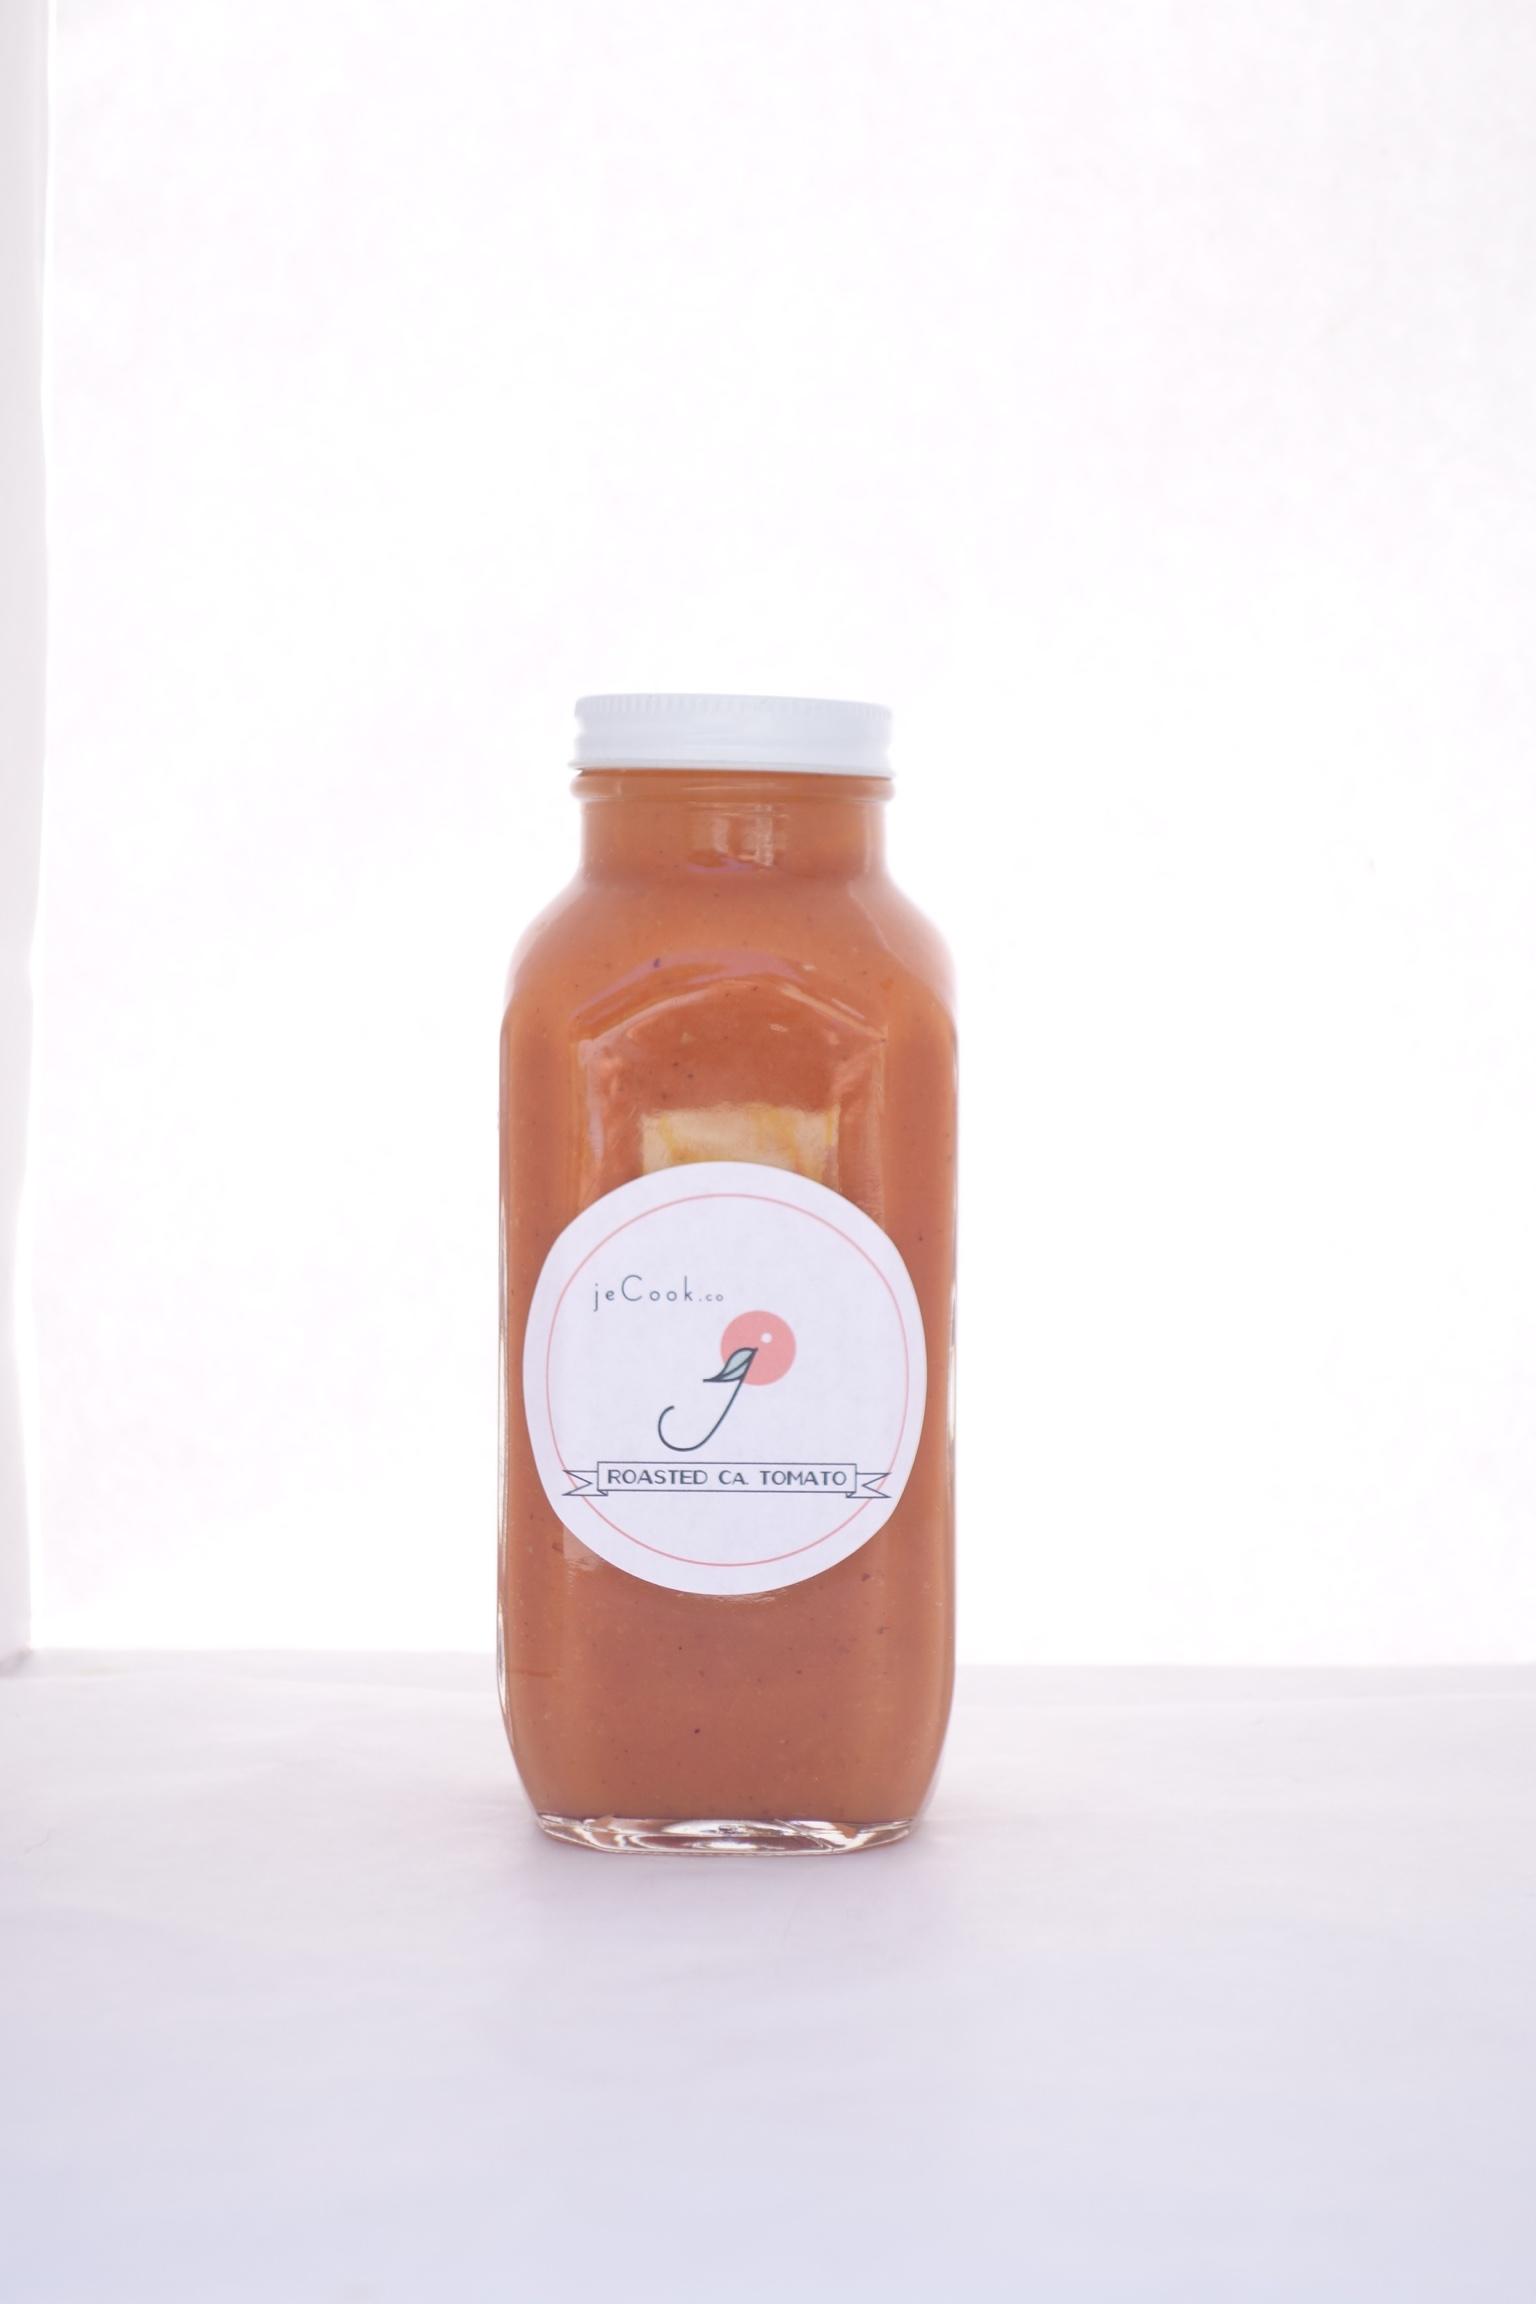 ROASTED CA TOMATO   ingredients:   costoluto tomato,onion, olive oil grapeseed oil, garlic,oregano, italian basil,pepper, salt,   Nutrition:   Vitamin C-Vitamin A - and VitaminE and K - iron - magnesepotassium - lycopene